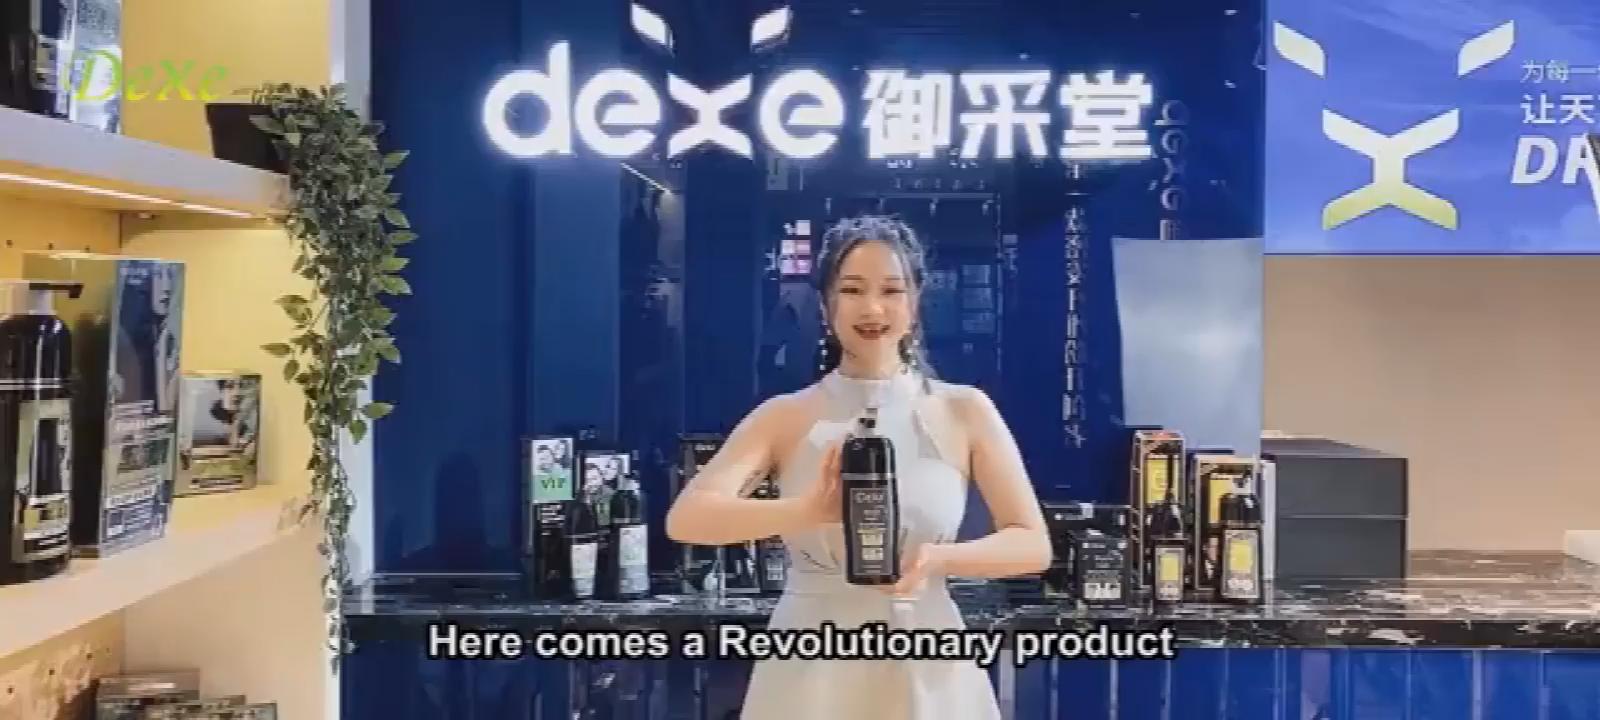 dexe subaru manufacturer wholesale permanent fast vip black hair shampoo squeeze bottle  private label